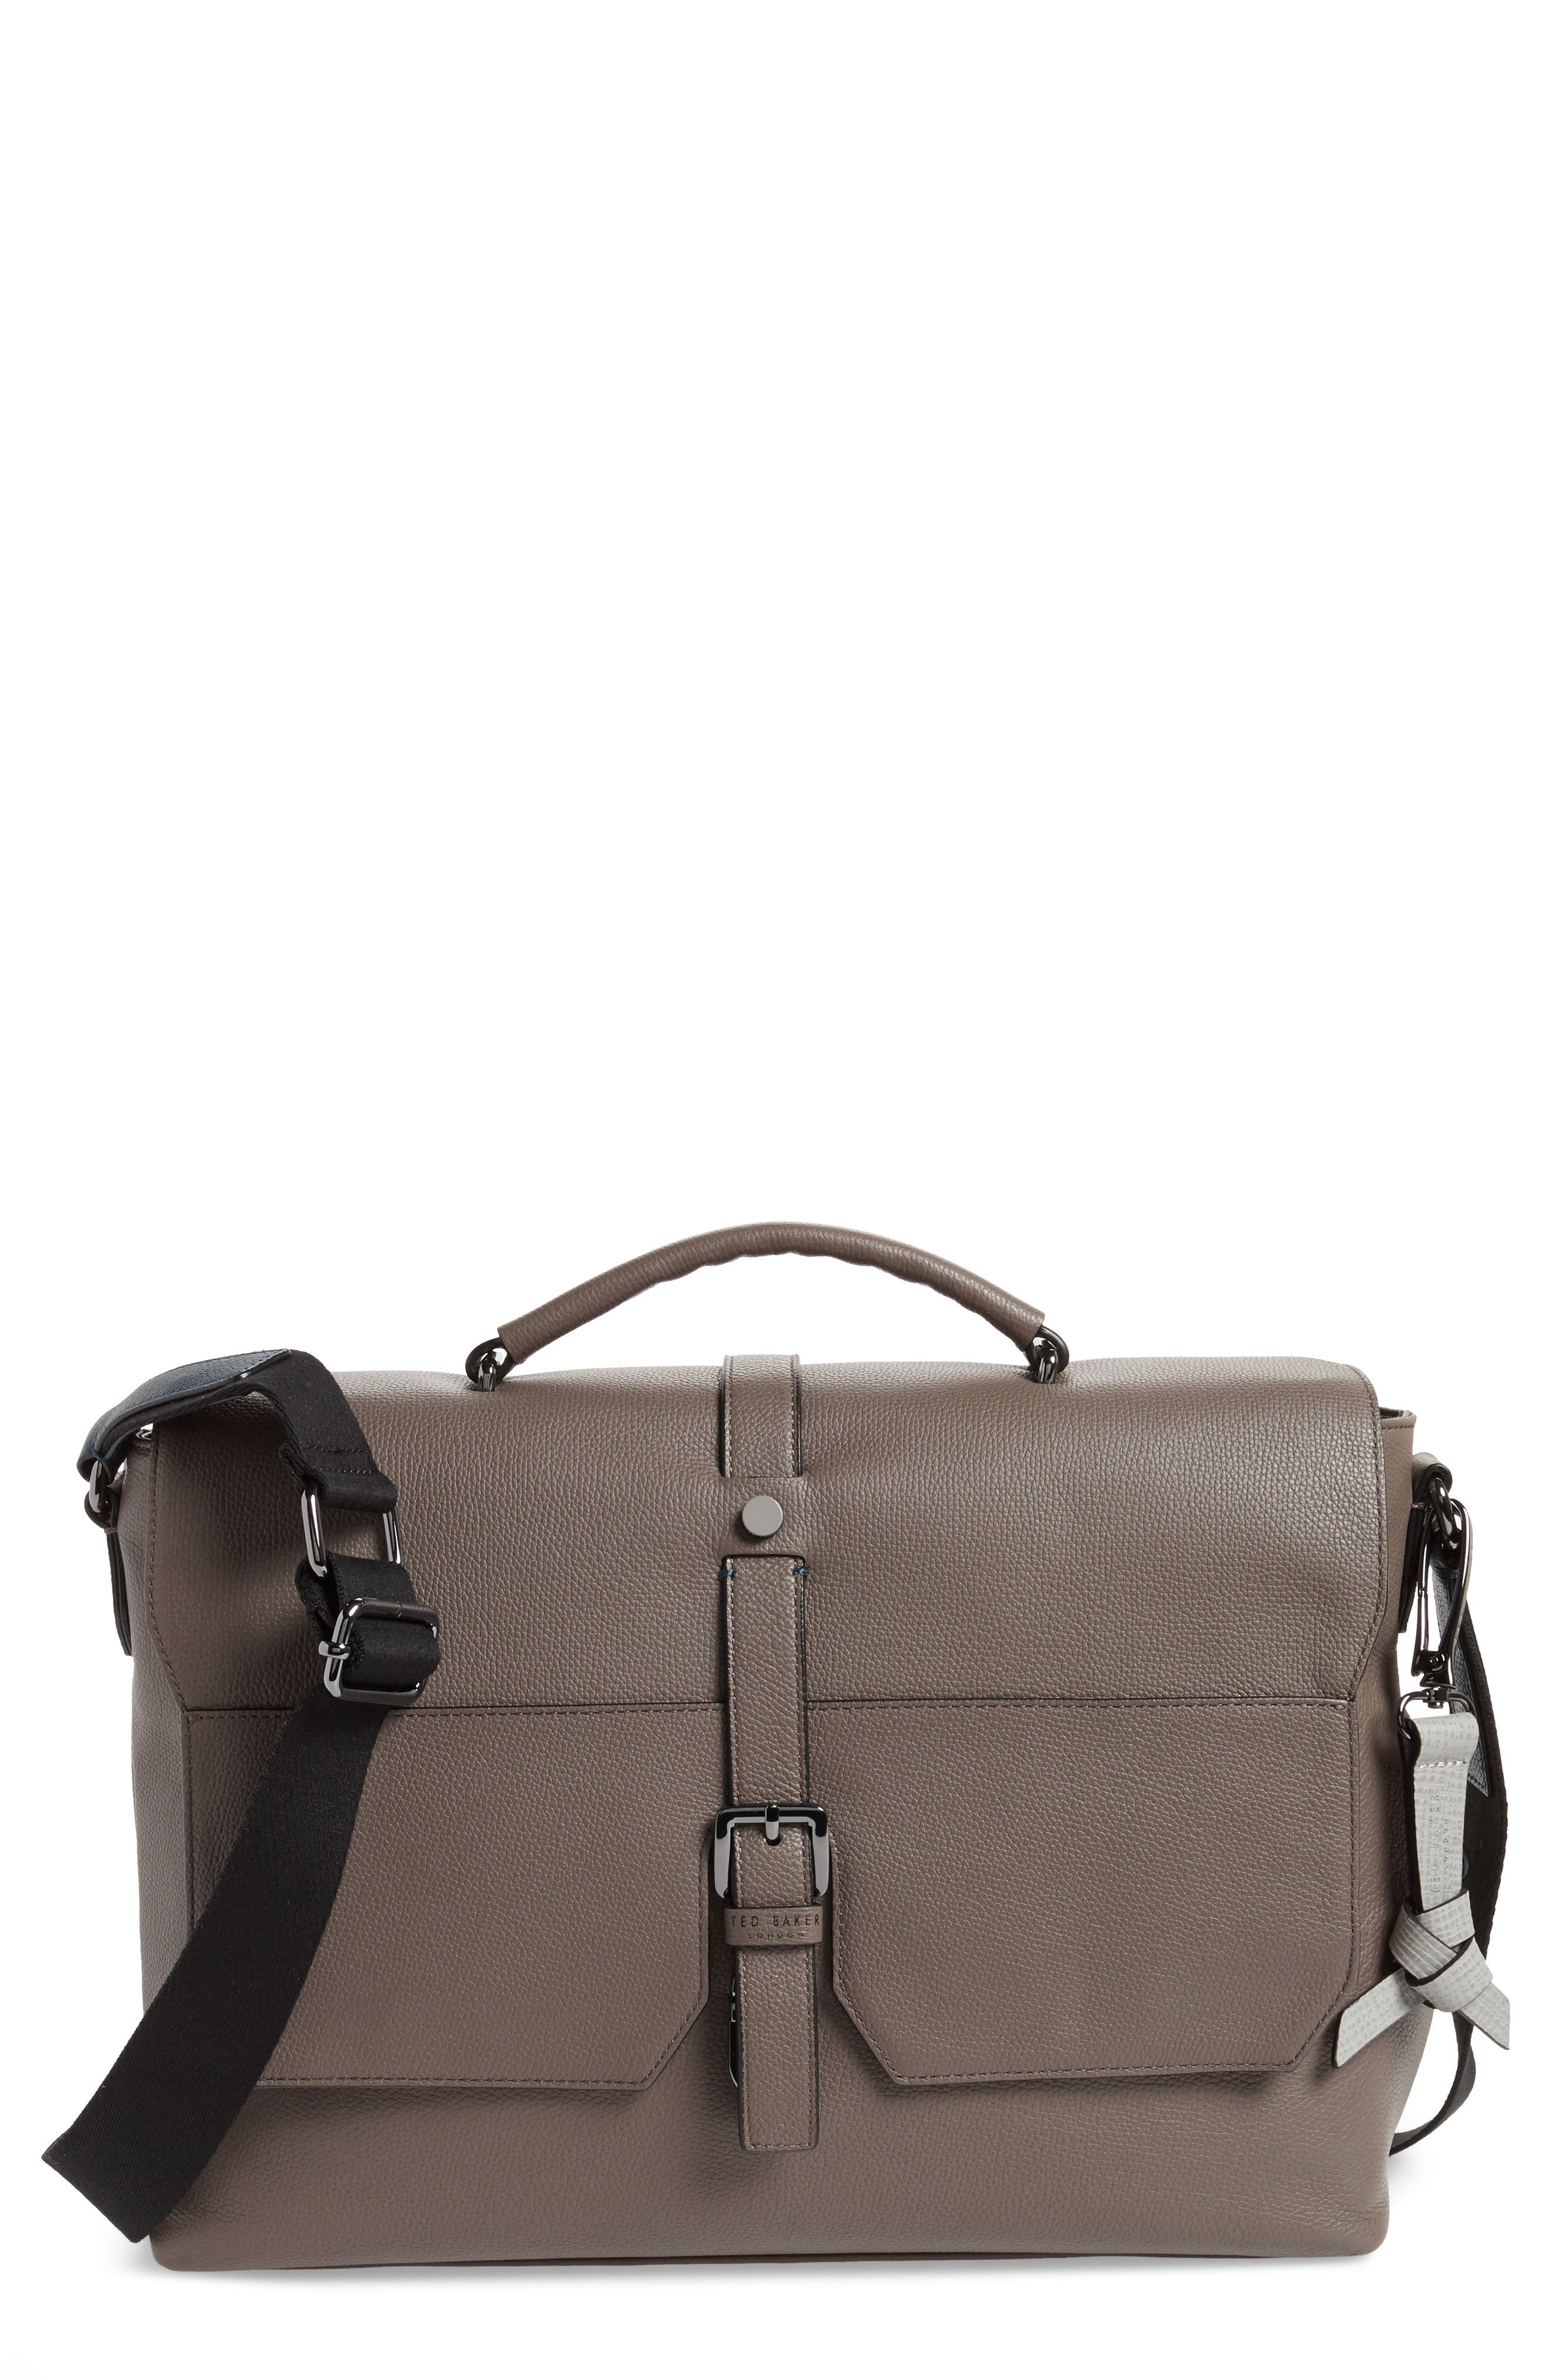 Ted Baker Sandune Leather Messenger Bag - Grey  9a0dca28016d6